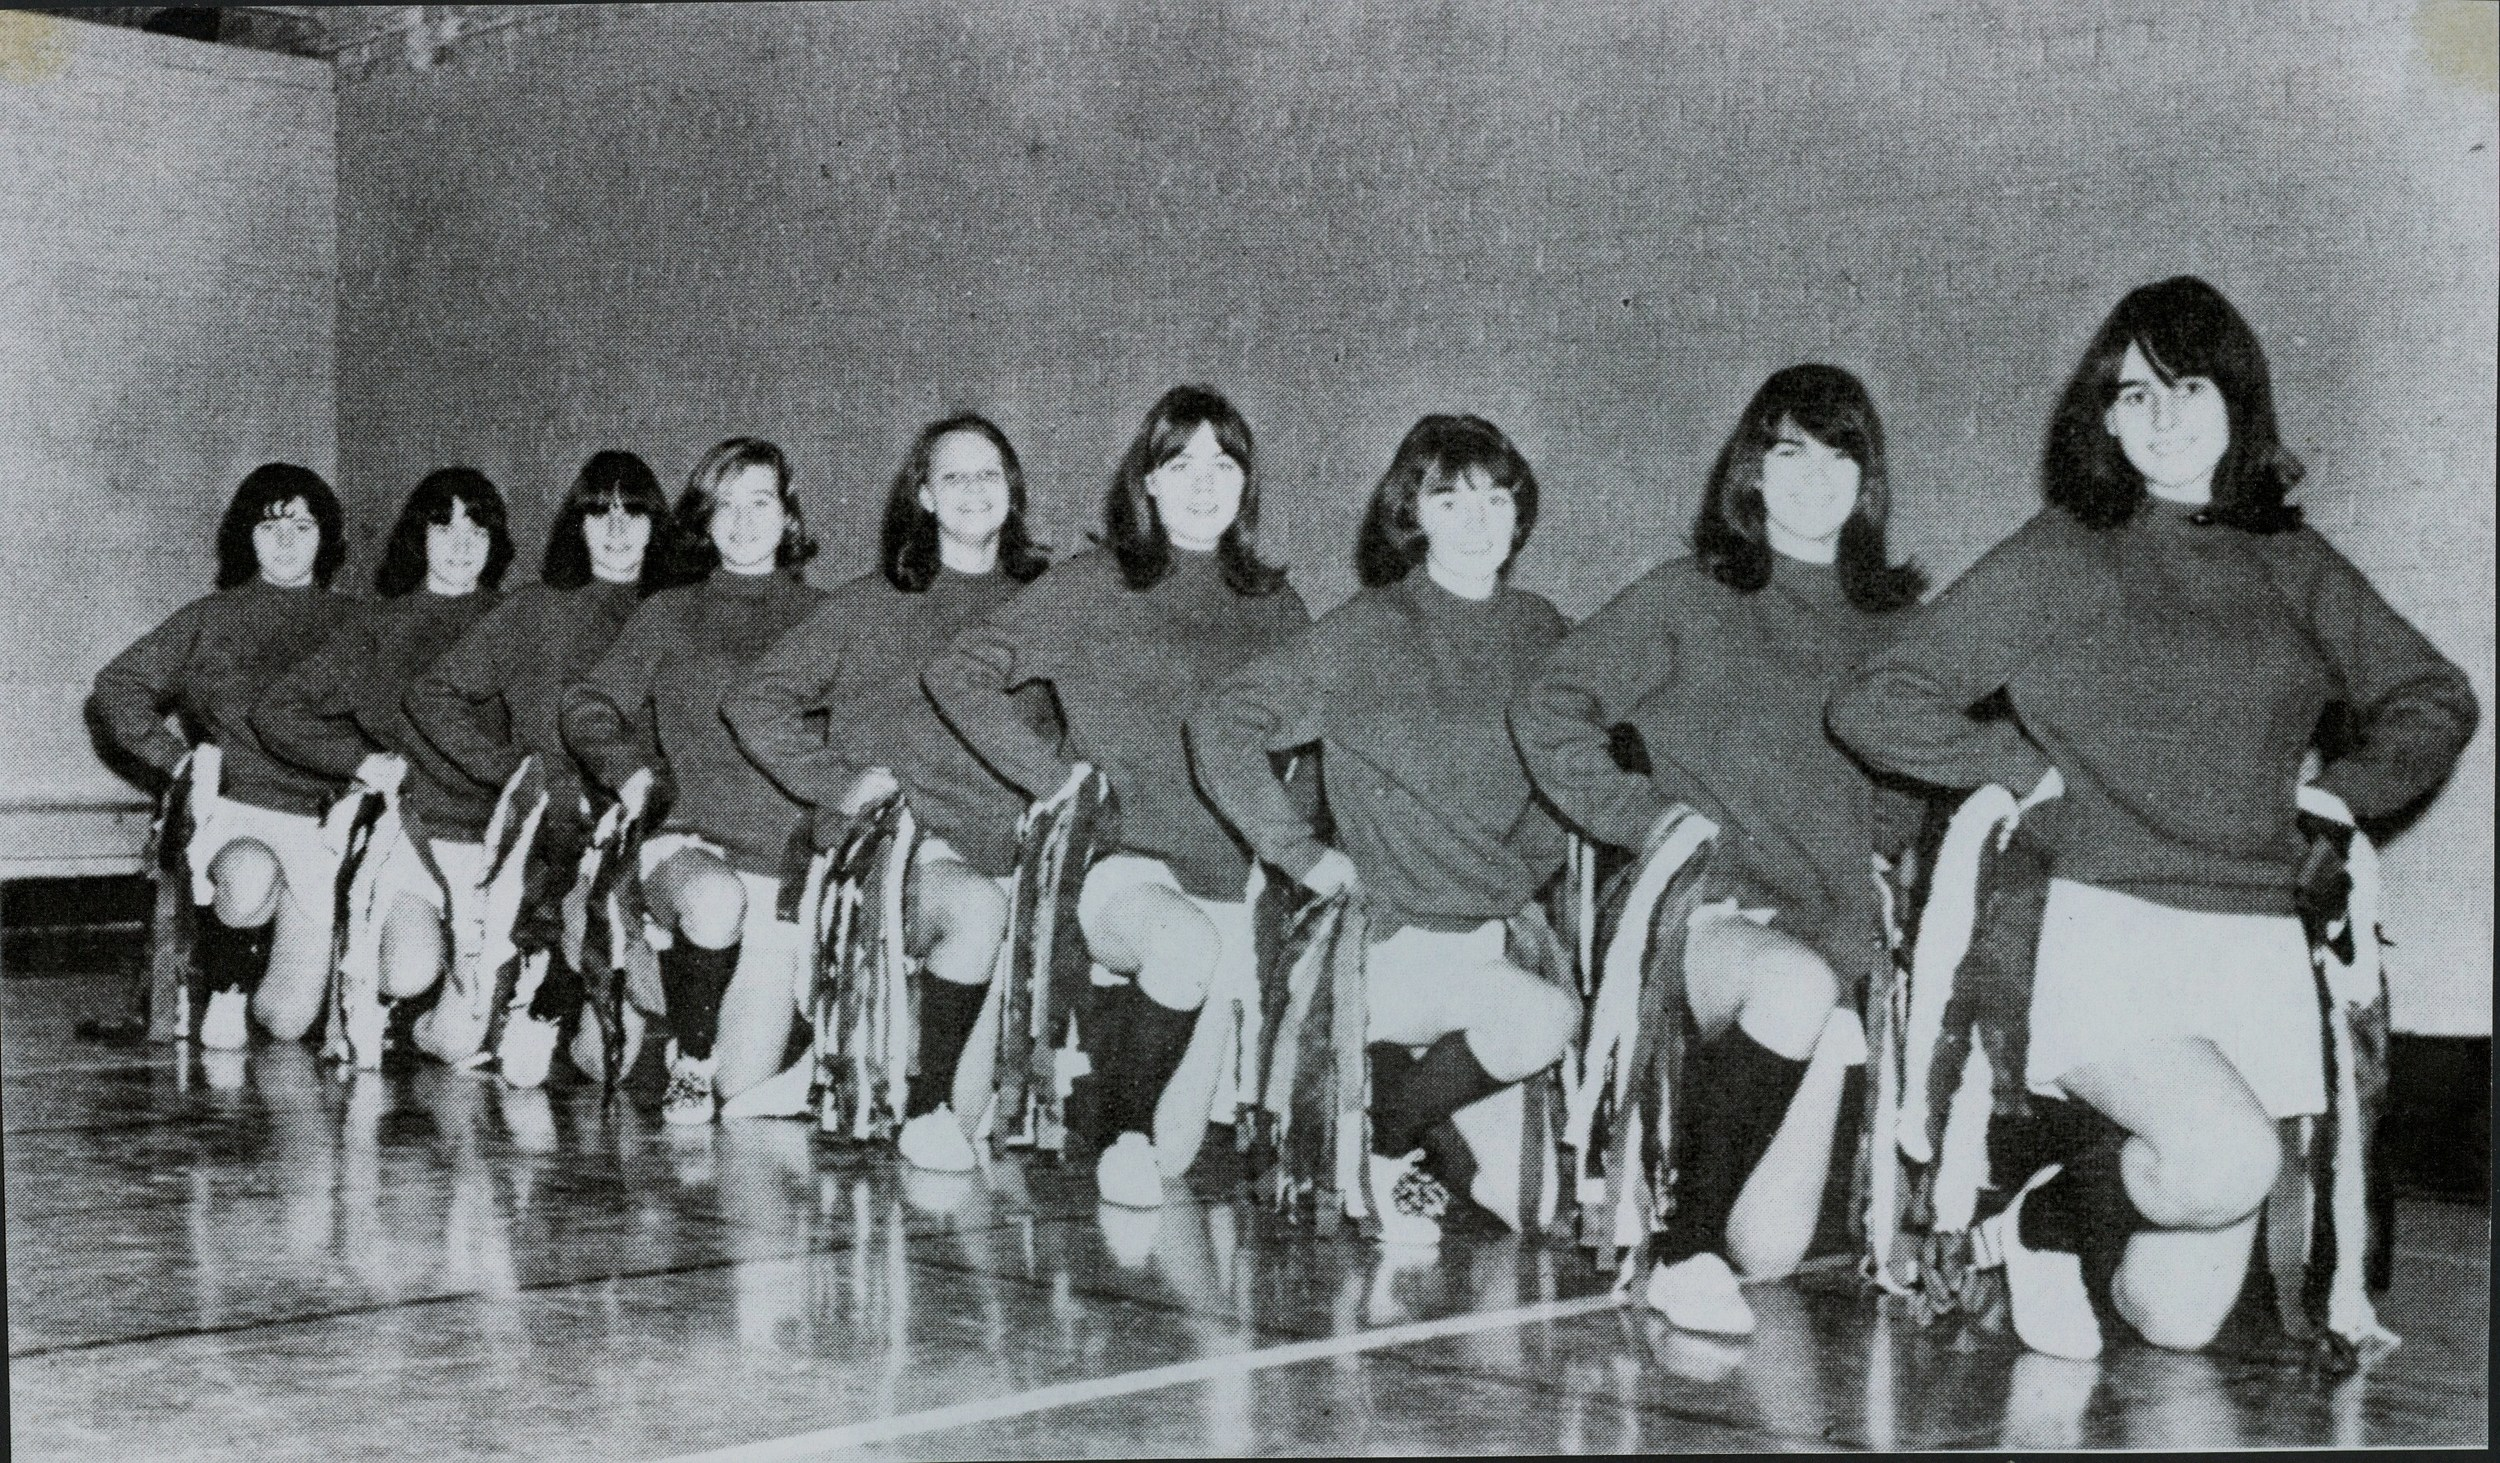 A olken, Maxine.MacDonald, Robson, Bleecker, B Rothermel, McGregr, Draper, O'Connor